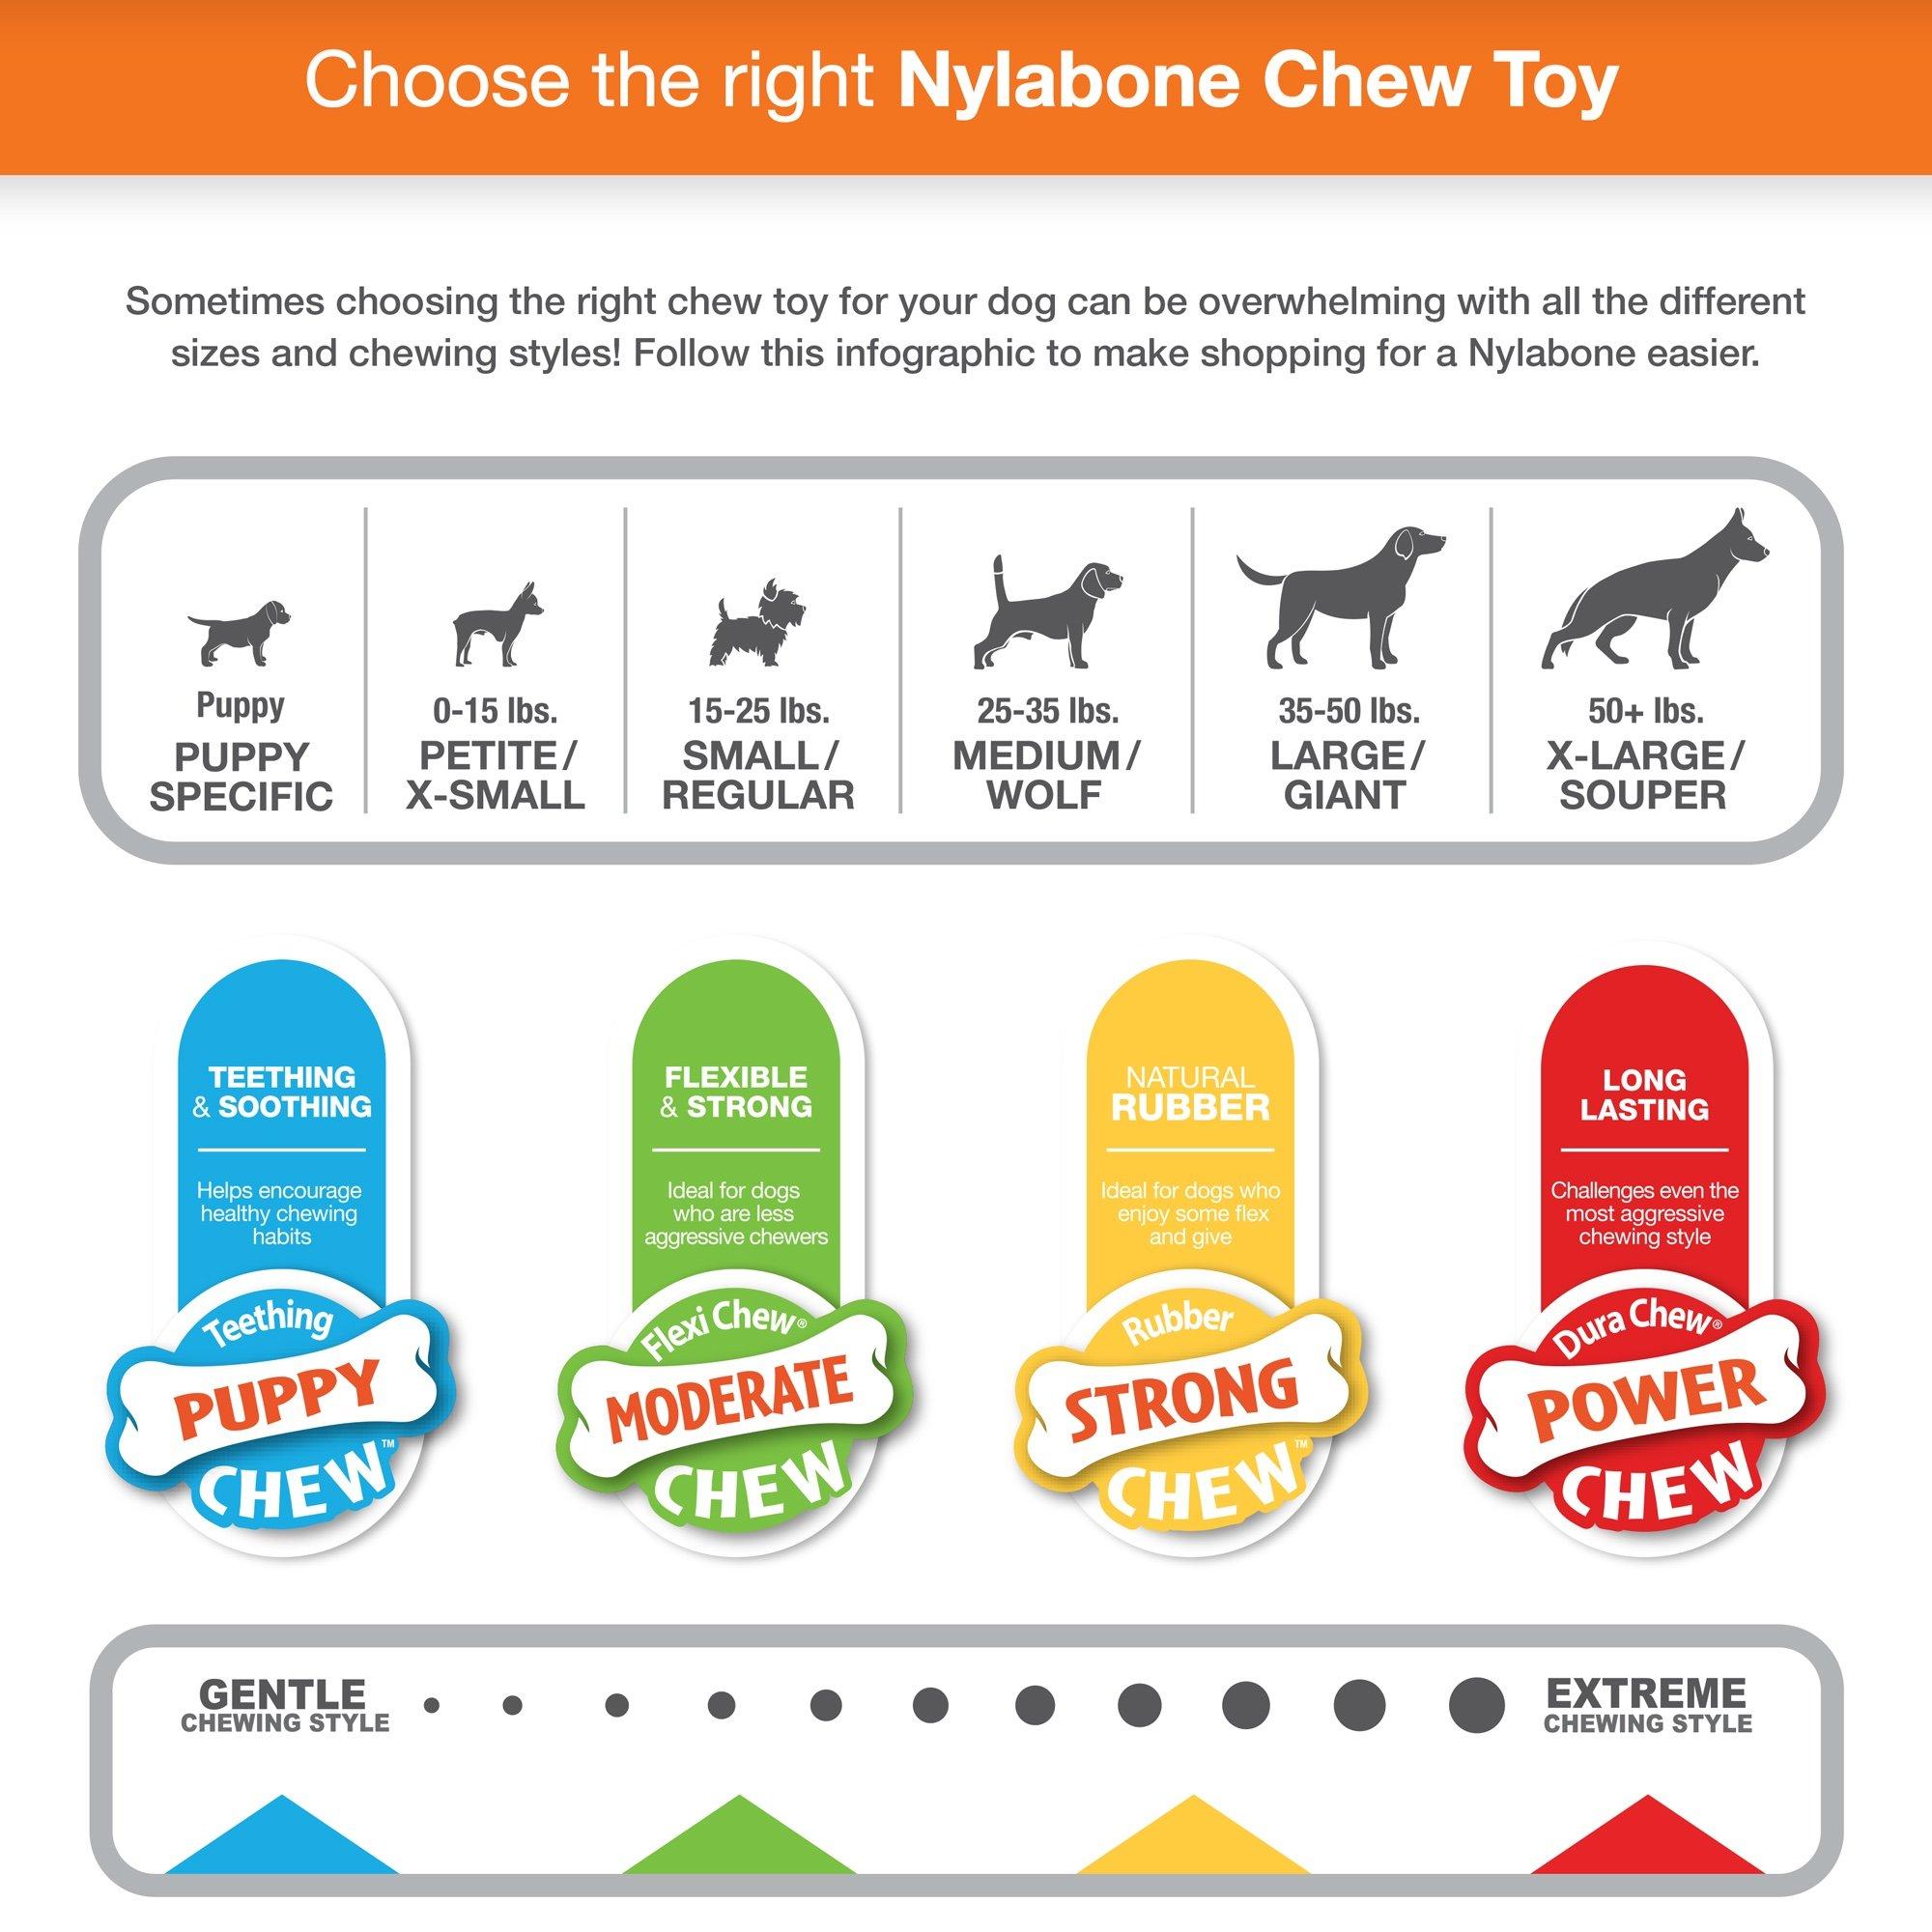 Nylabone Big Chew Monster Original Flavored Durable Toy Turkey Leg Bone for Large Breeds by Nylabone (Image #5)